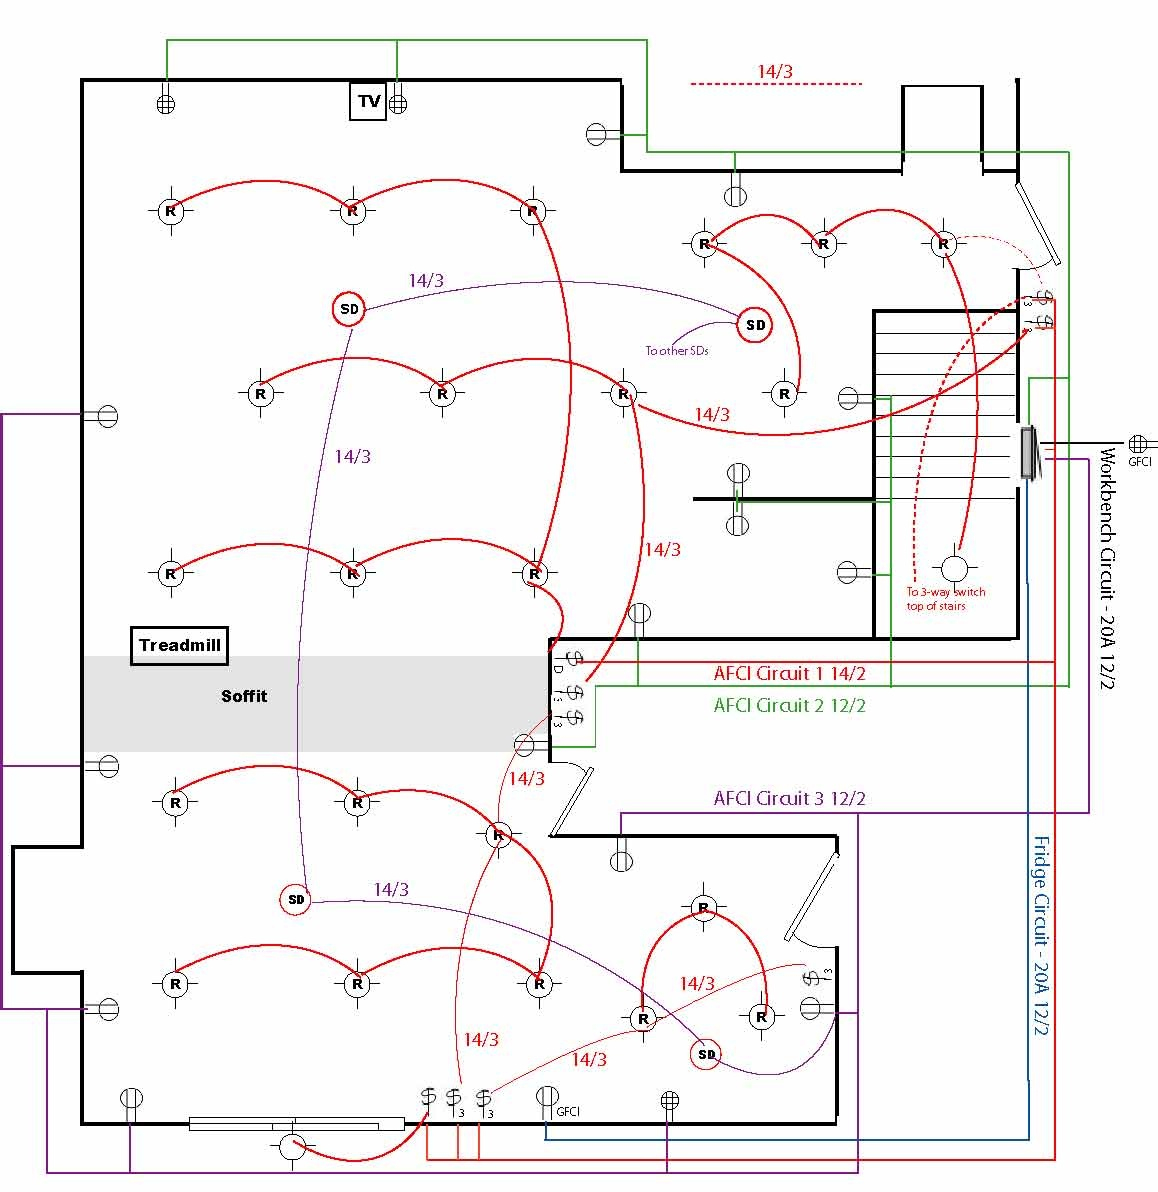 Home Electrical Wiring Pdf | Wiring Diagram - Electrical Wiring Diagram Pdf